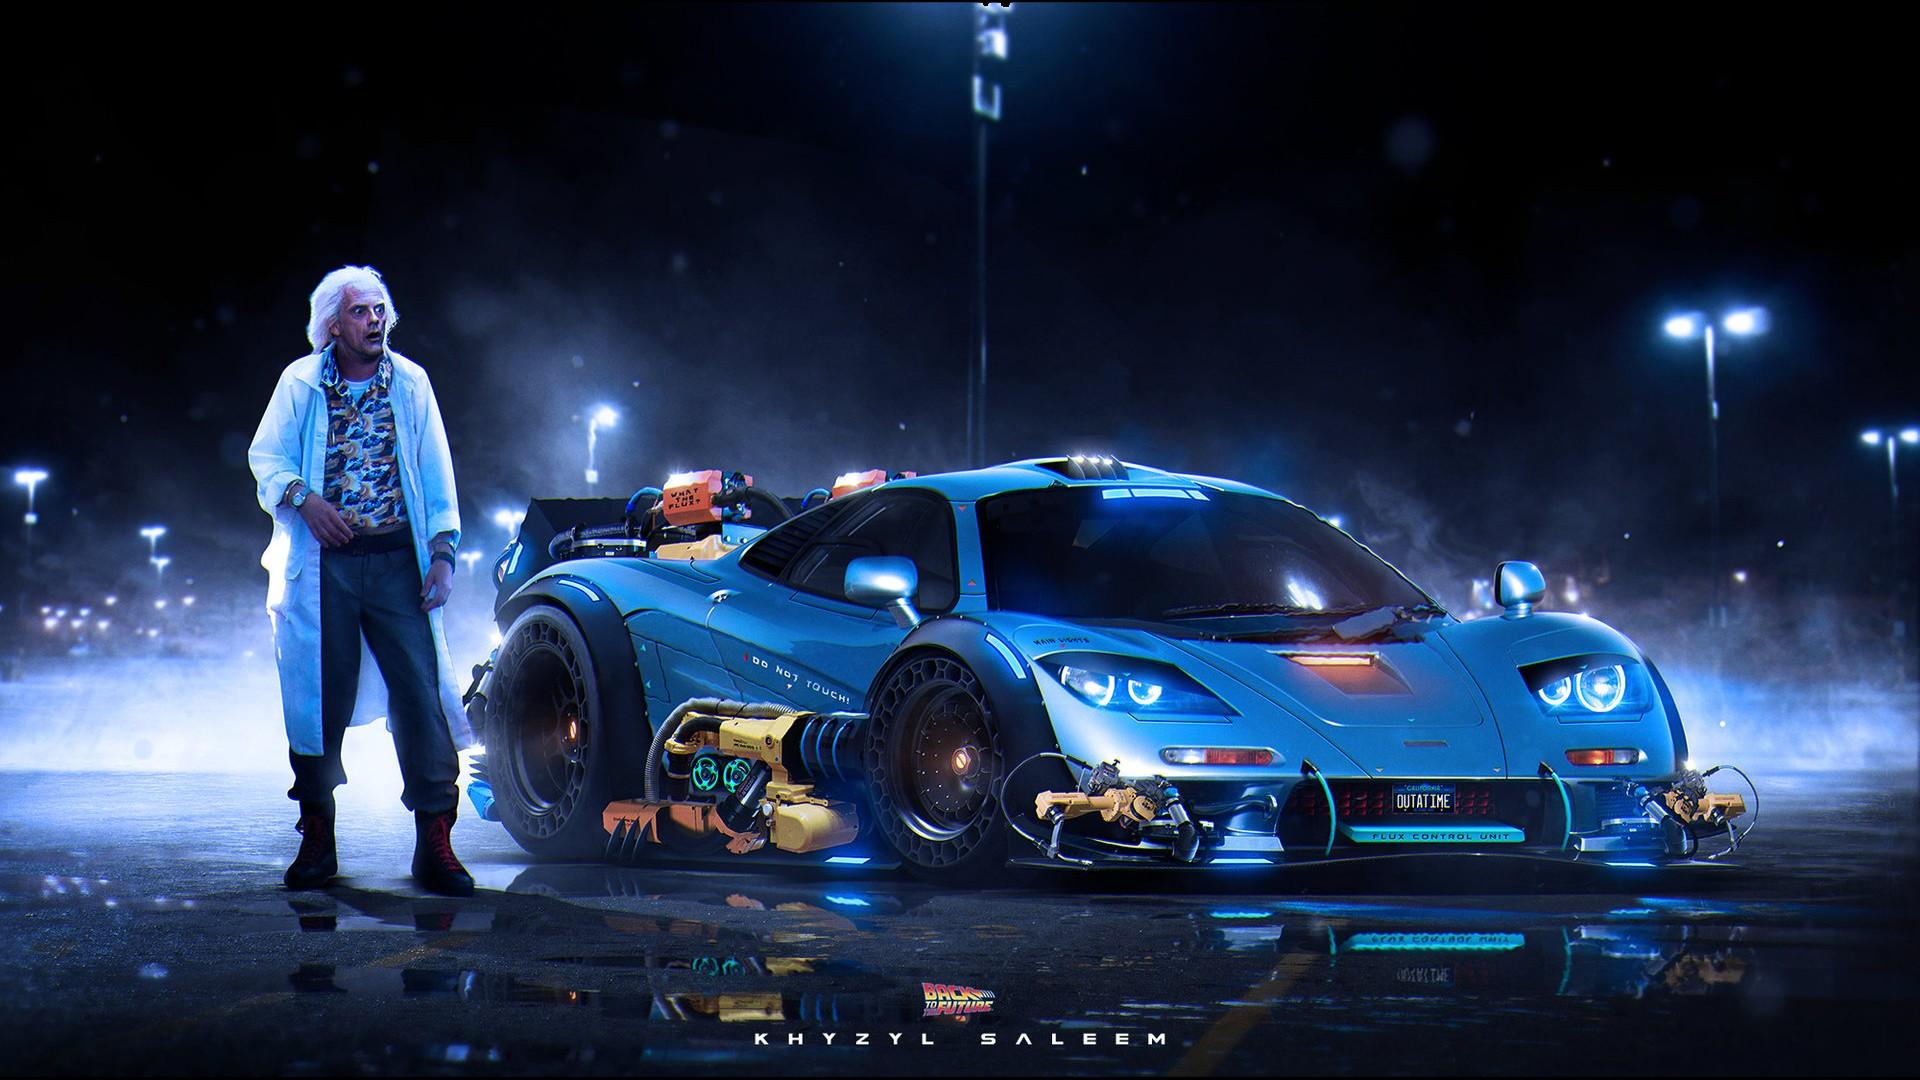 Wallpaper Digital Art Artwork Back To The Future Sports Car Dr